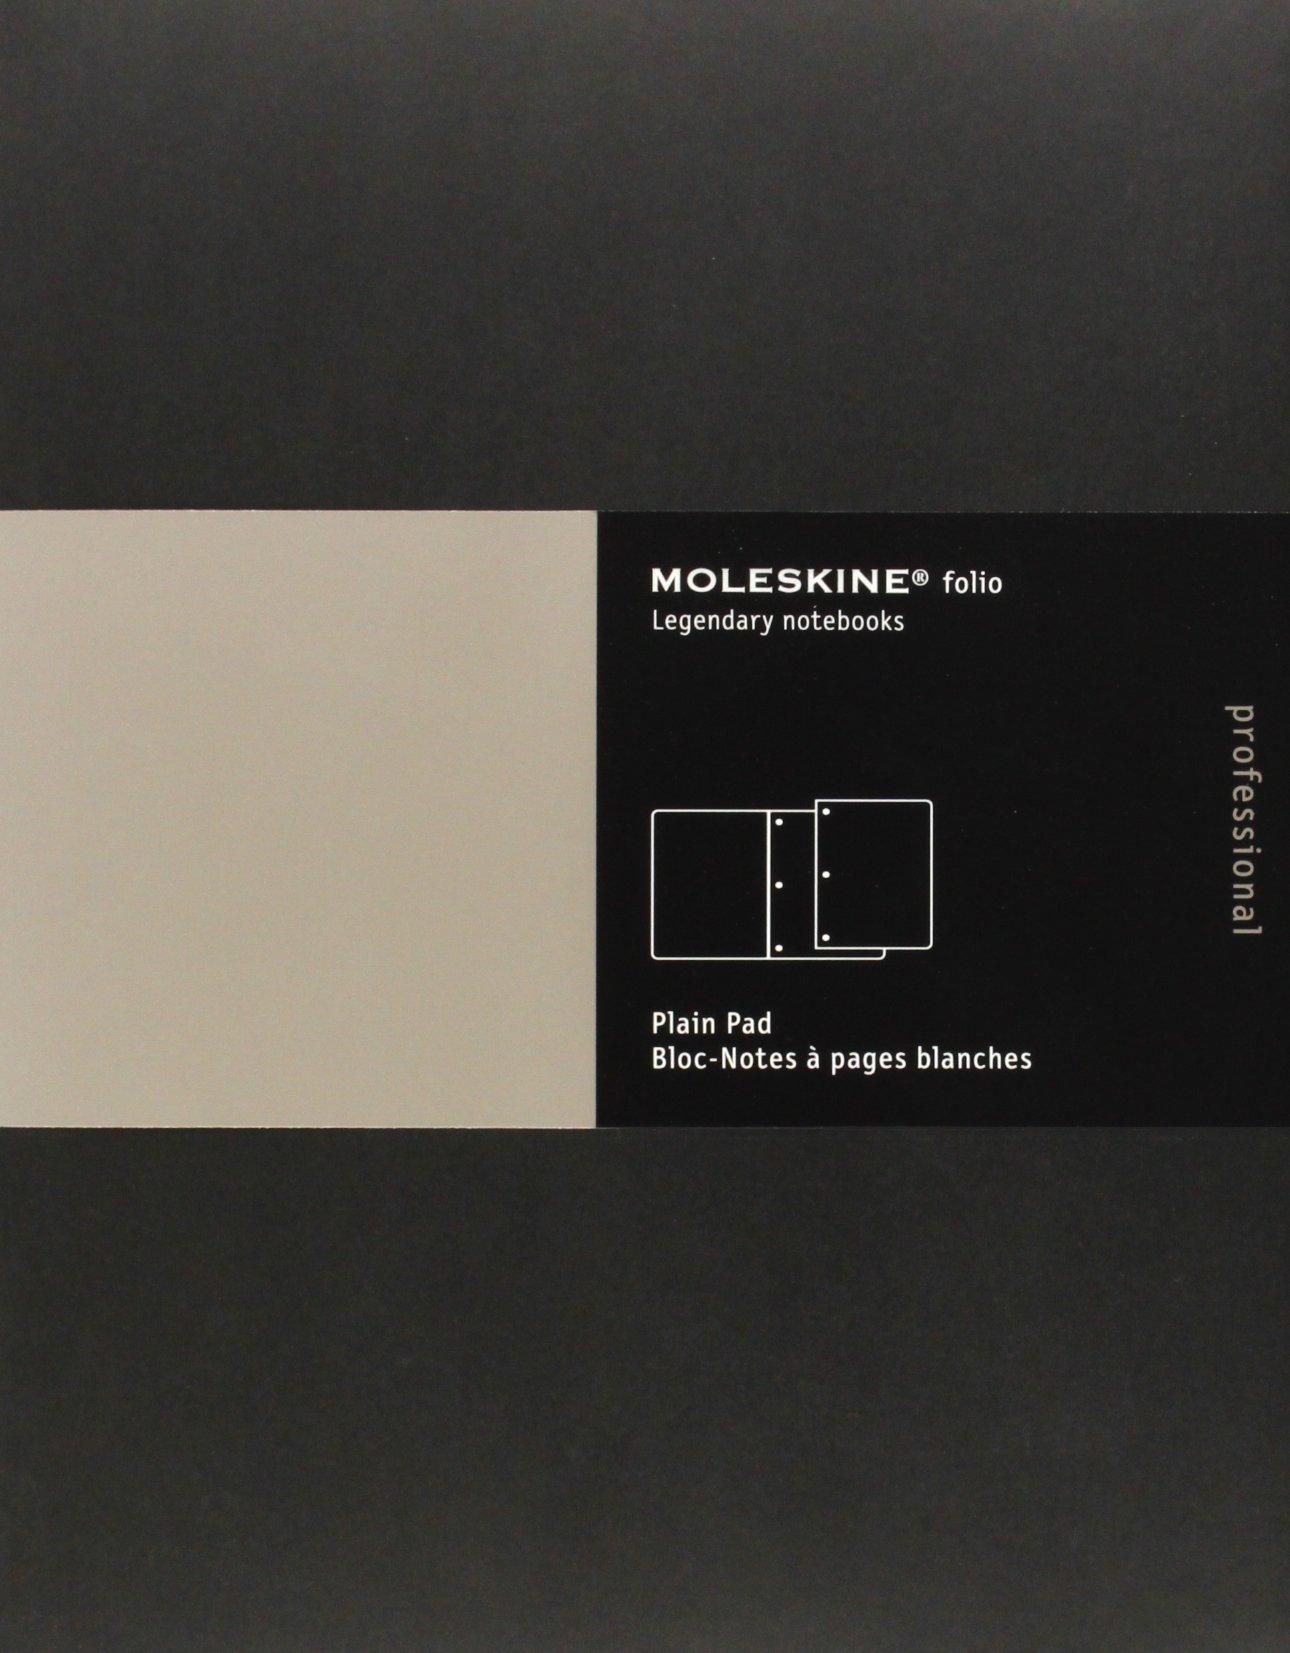 Moleskine Folio Professional Letter Ruled